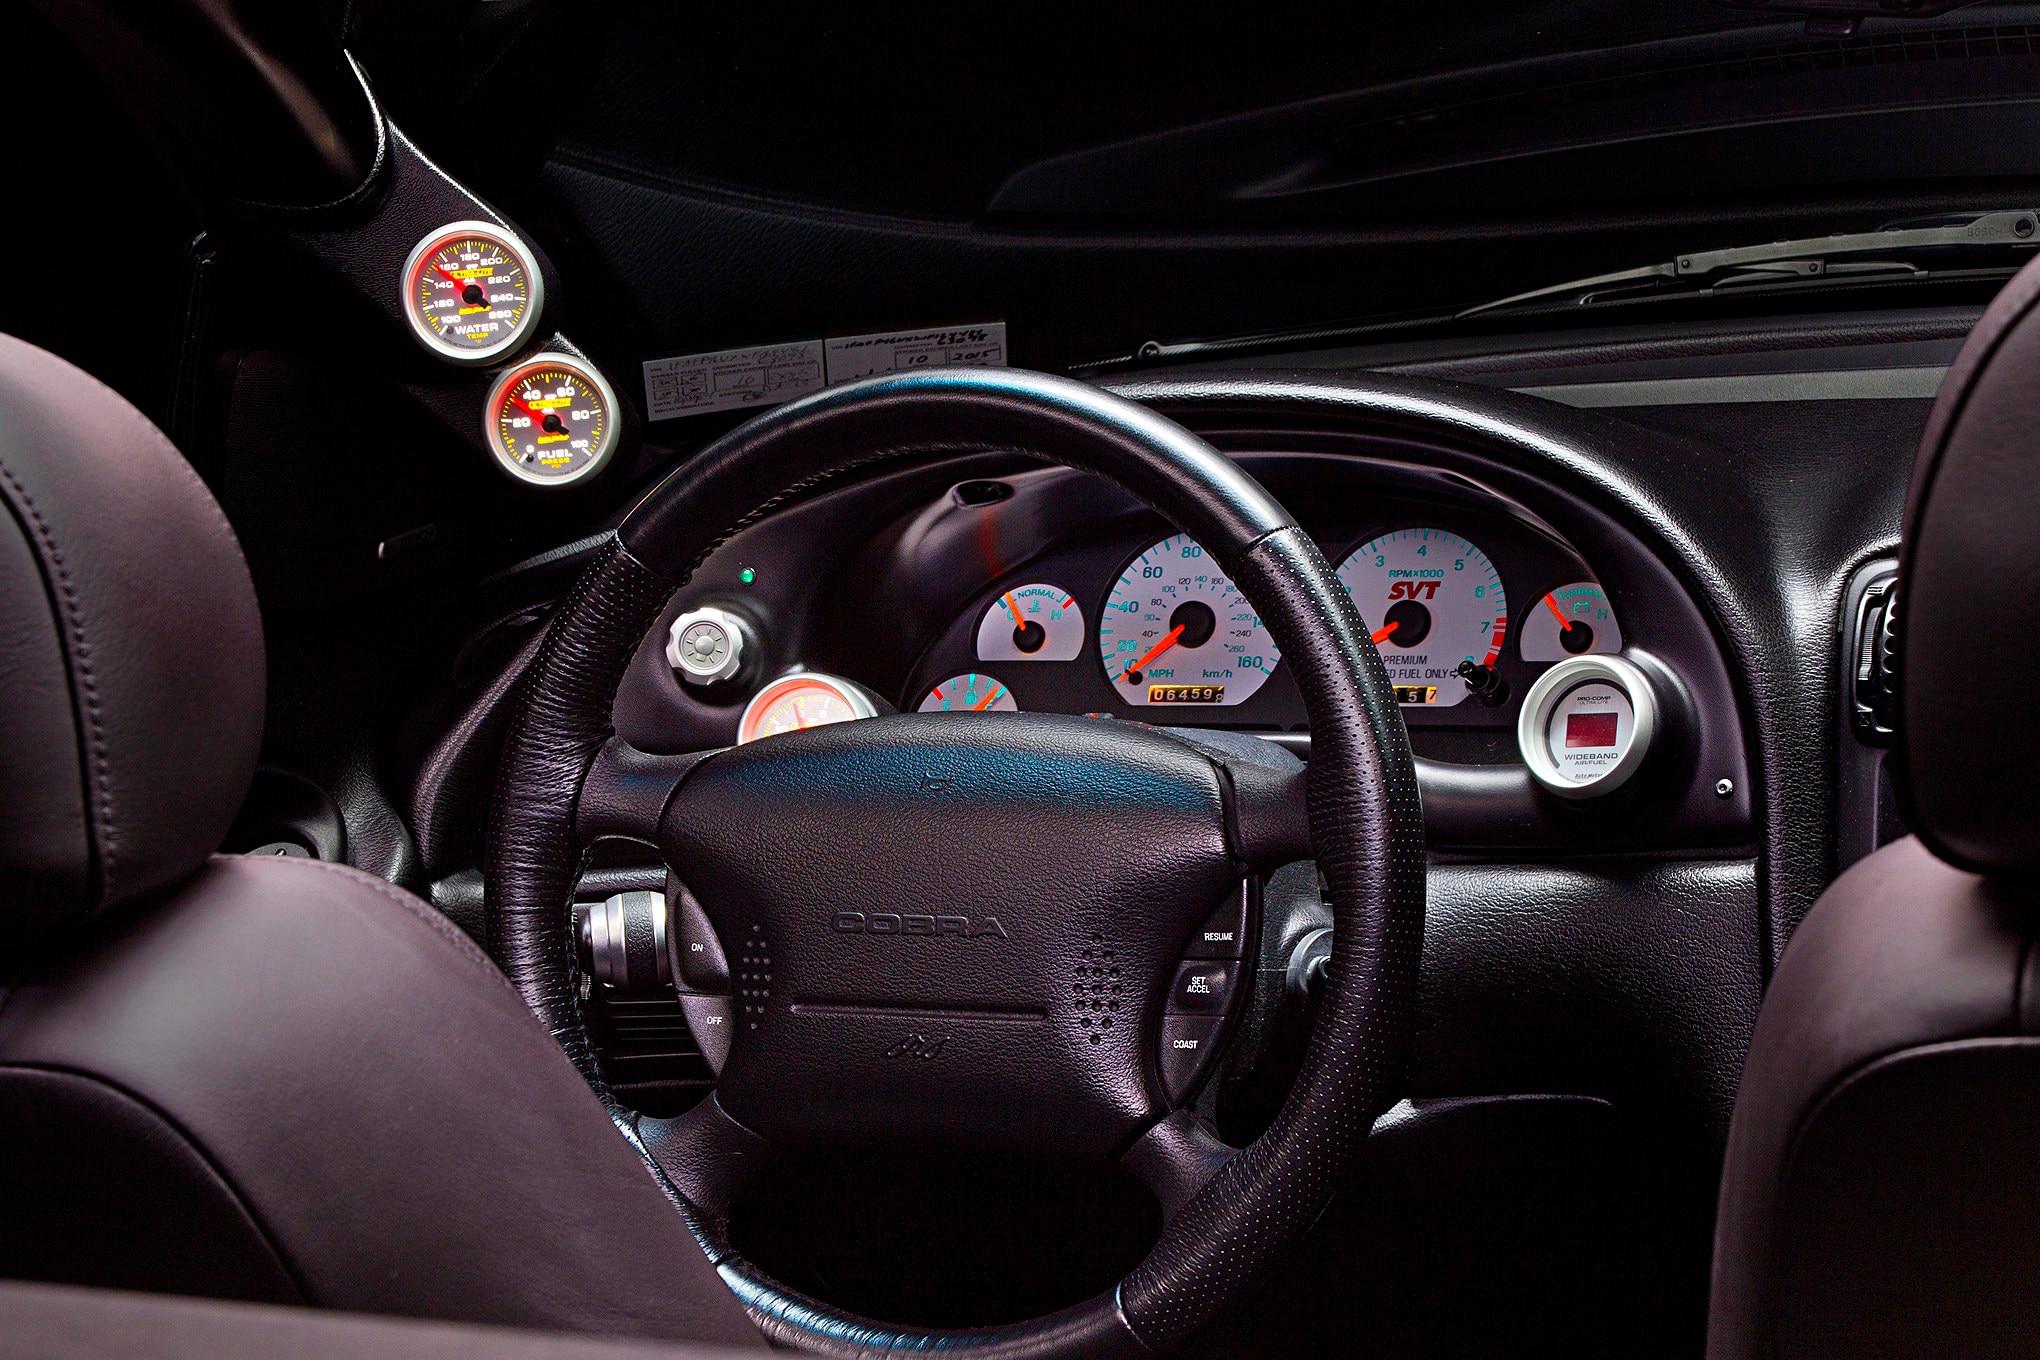 1998 Ford Mustang Cobra 026